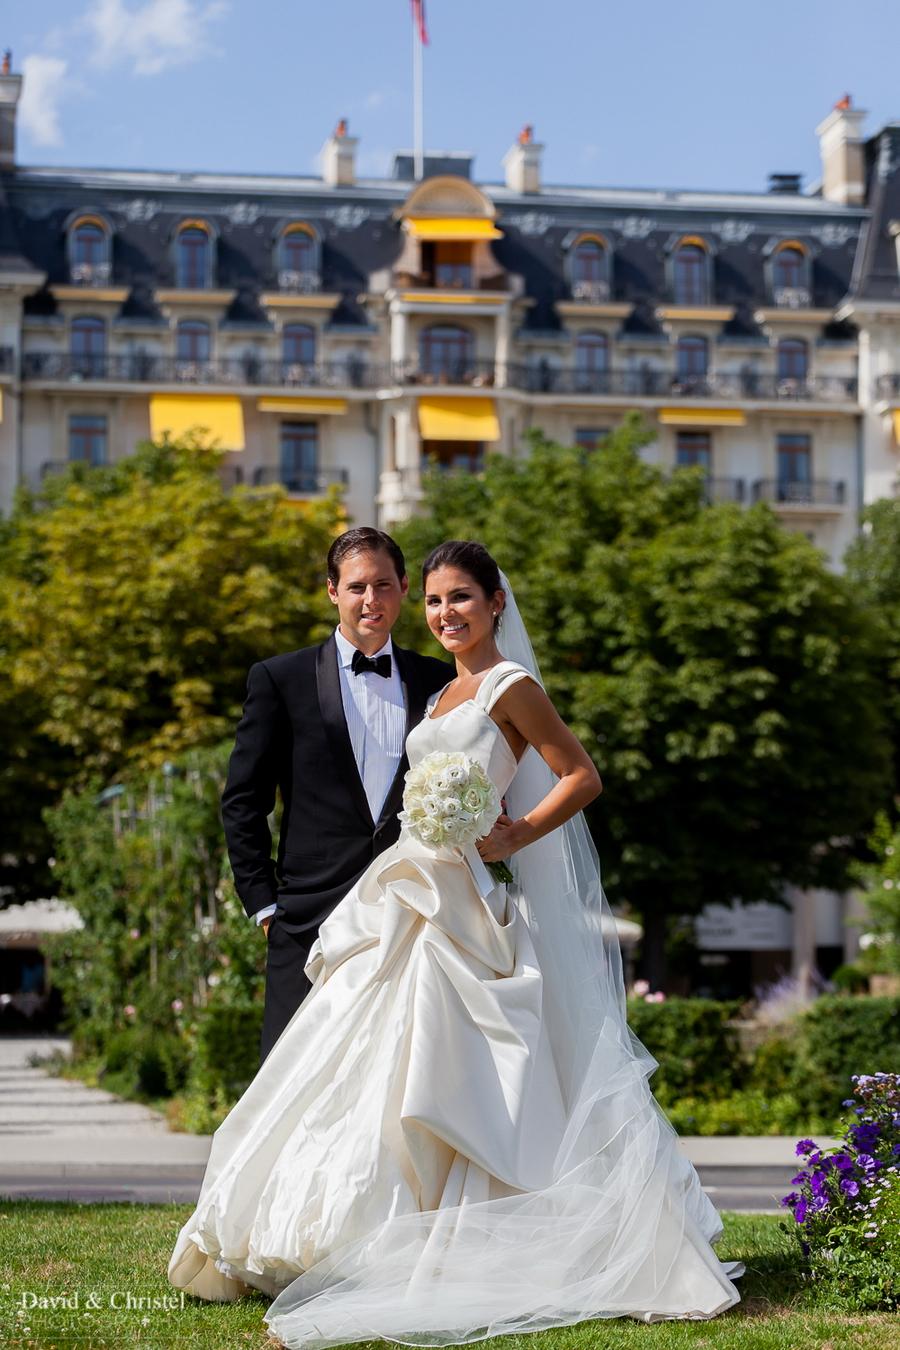 photographe mariage lausanne 24